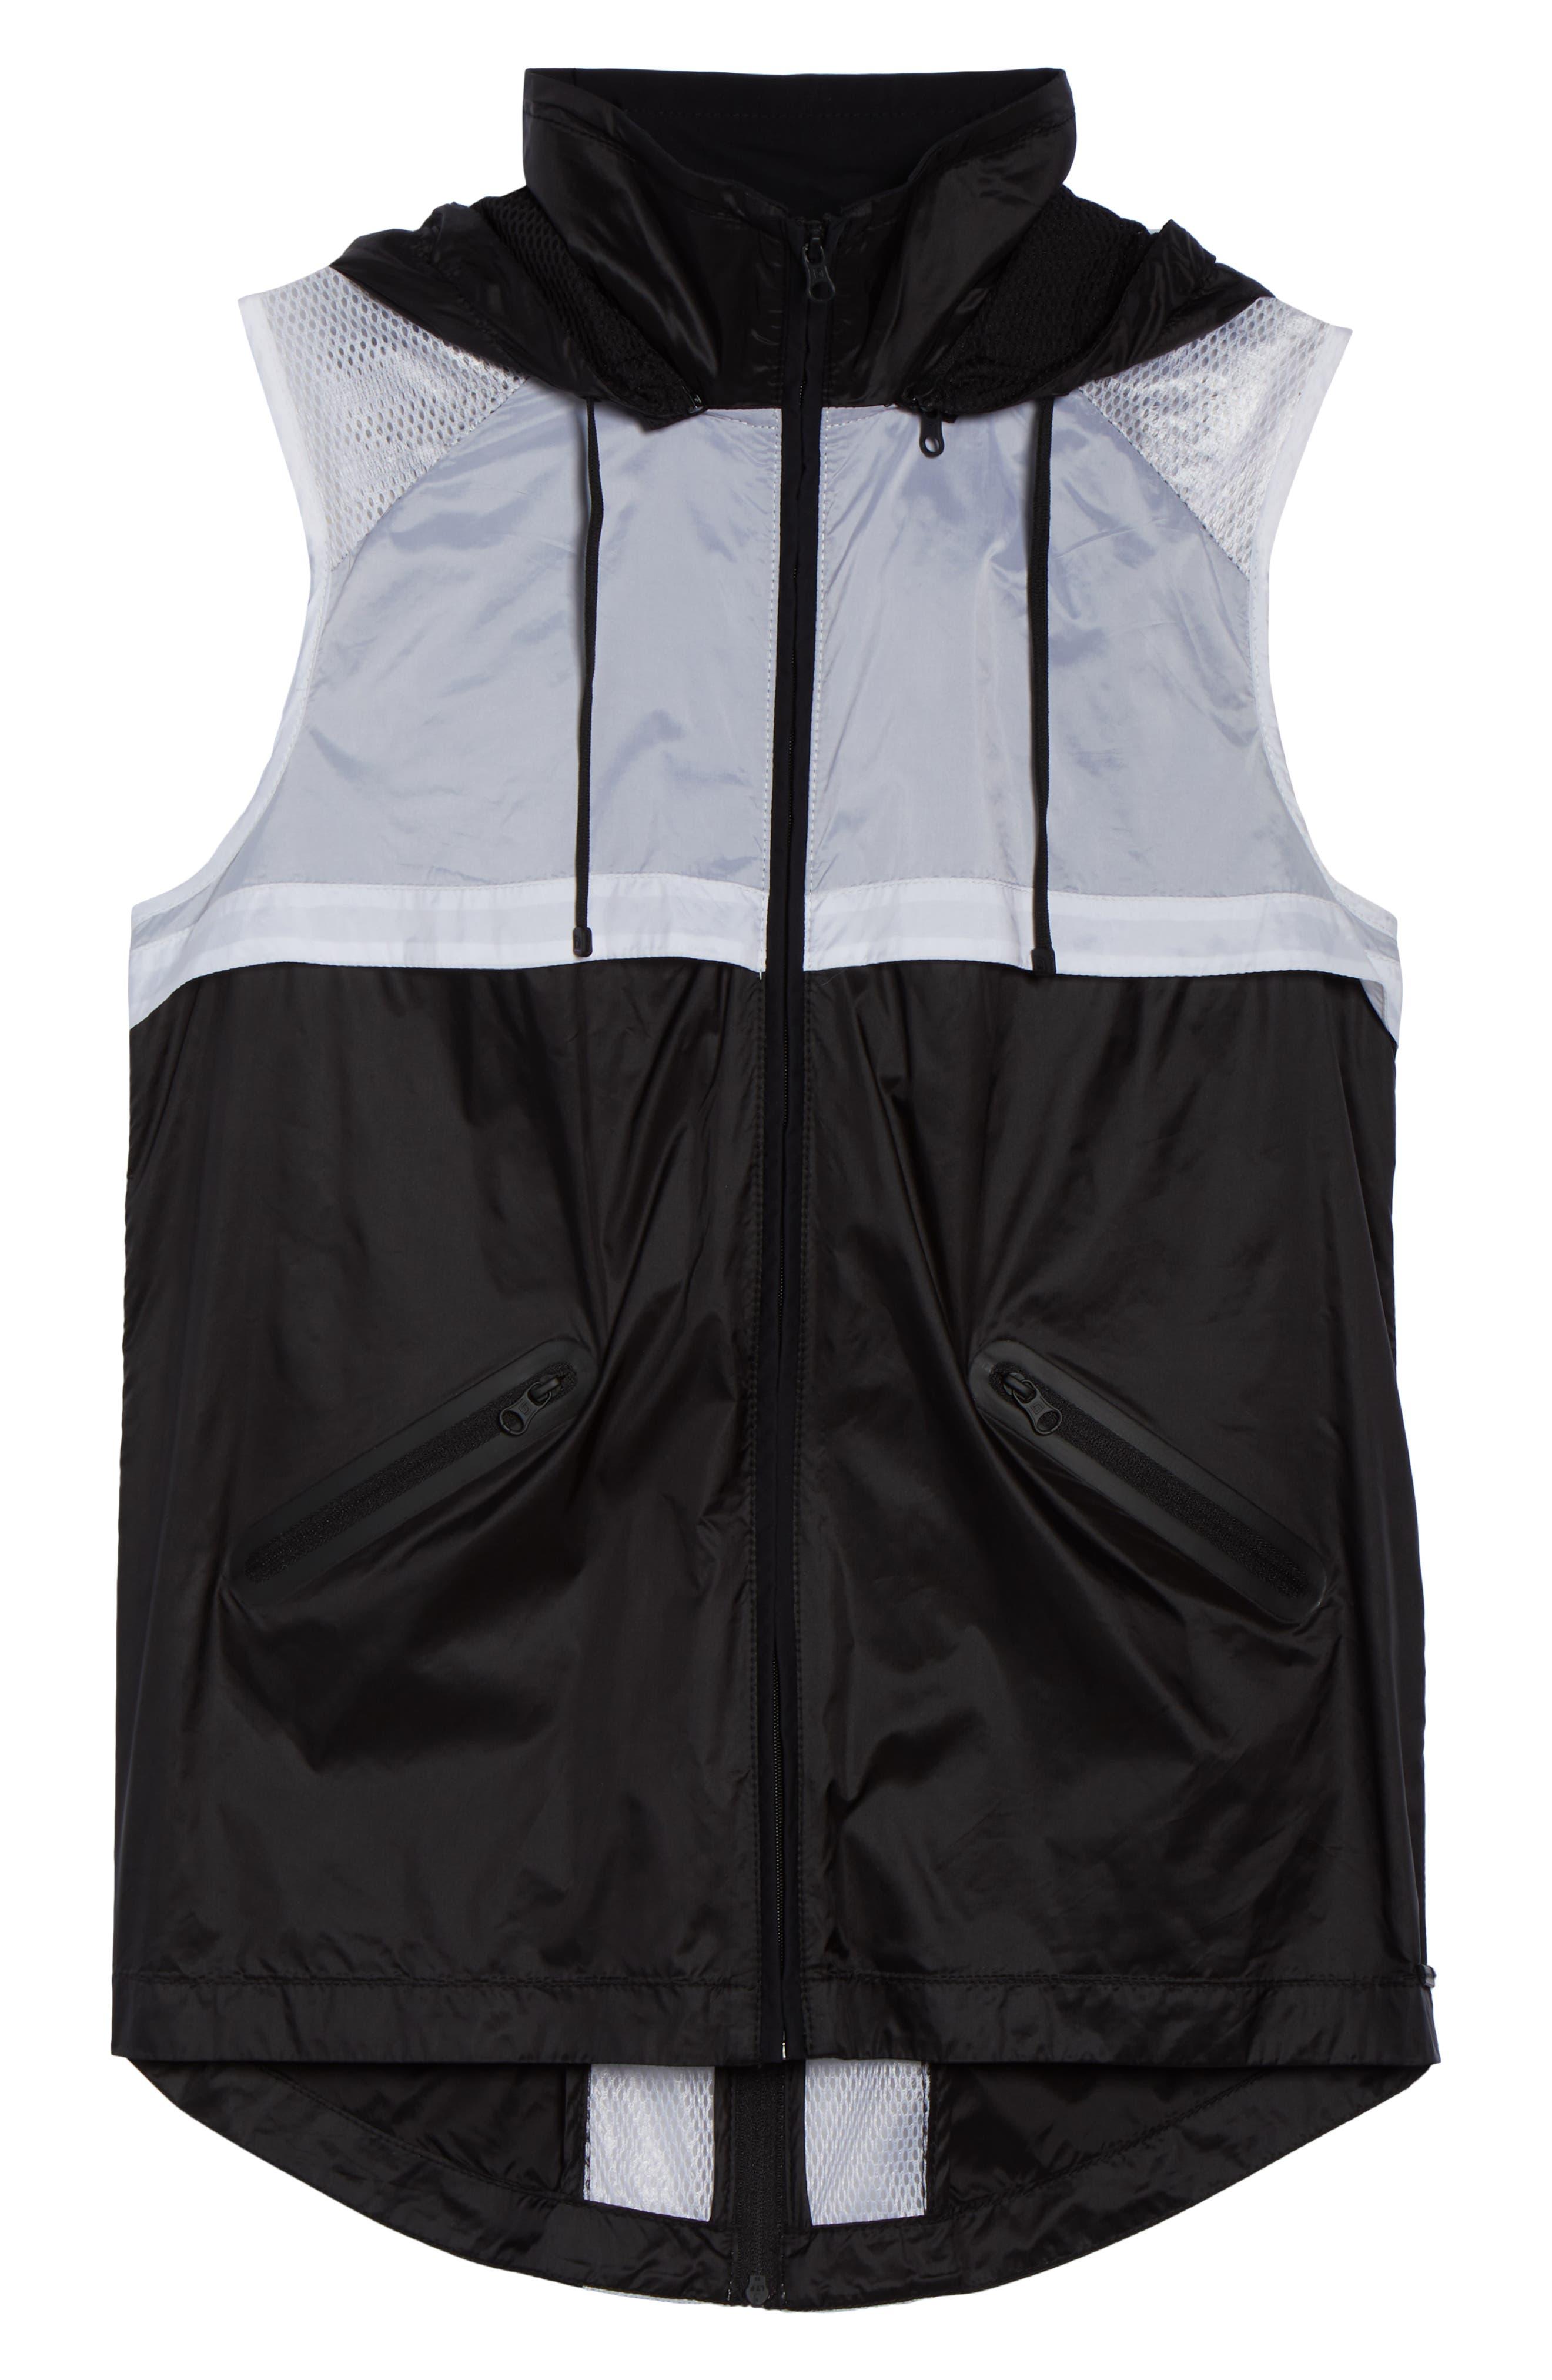 Moonlight Vest,                             Alternate thumbnail 7, color,                             Black